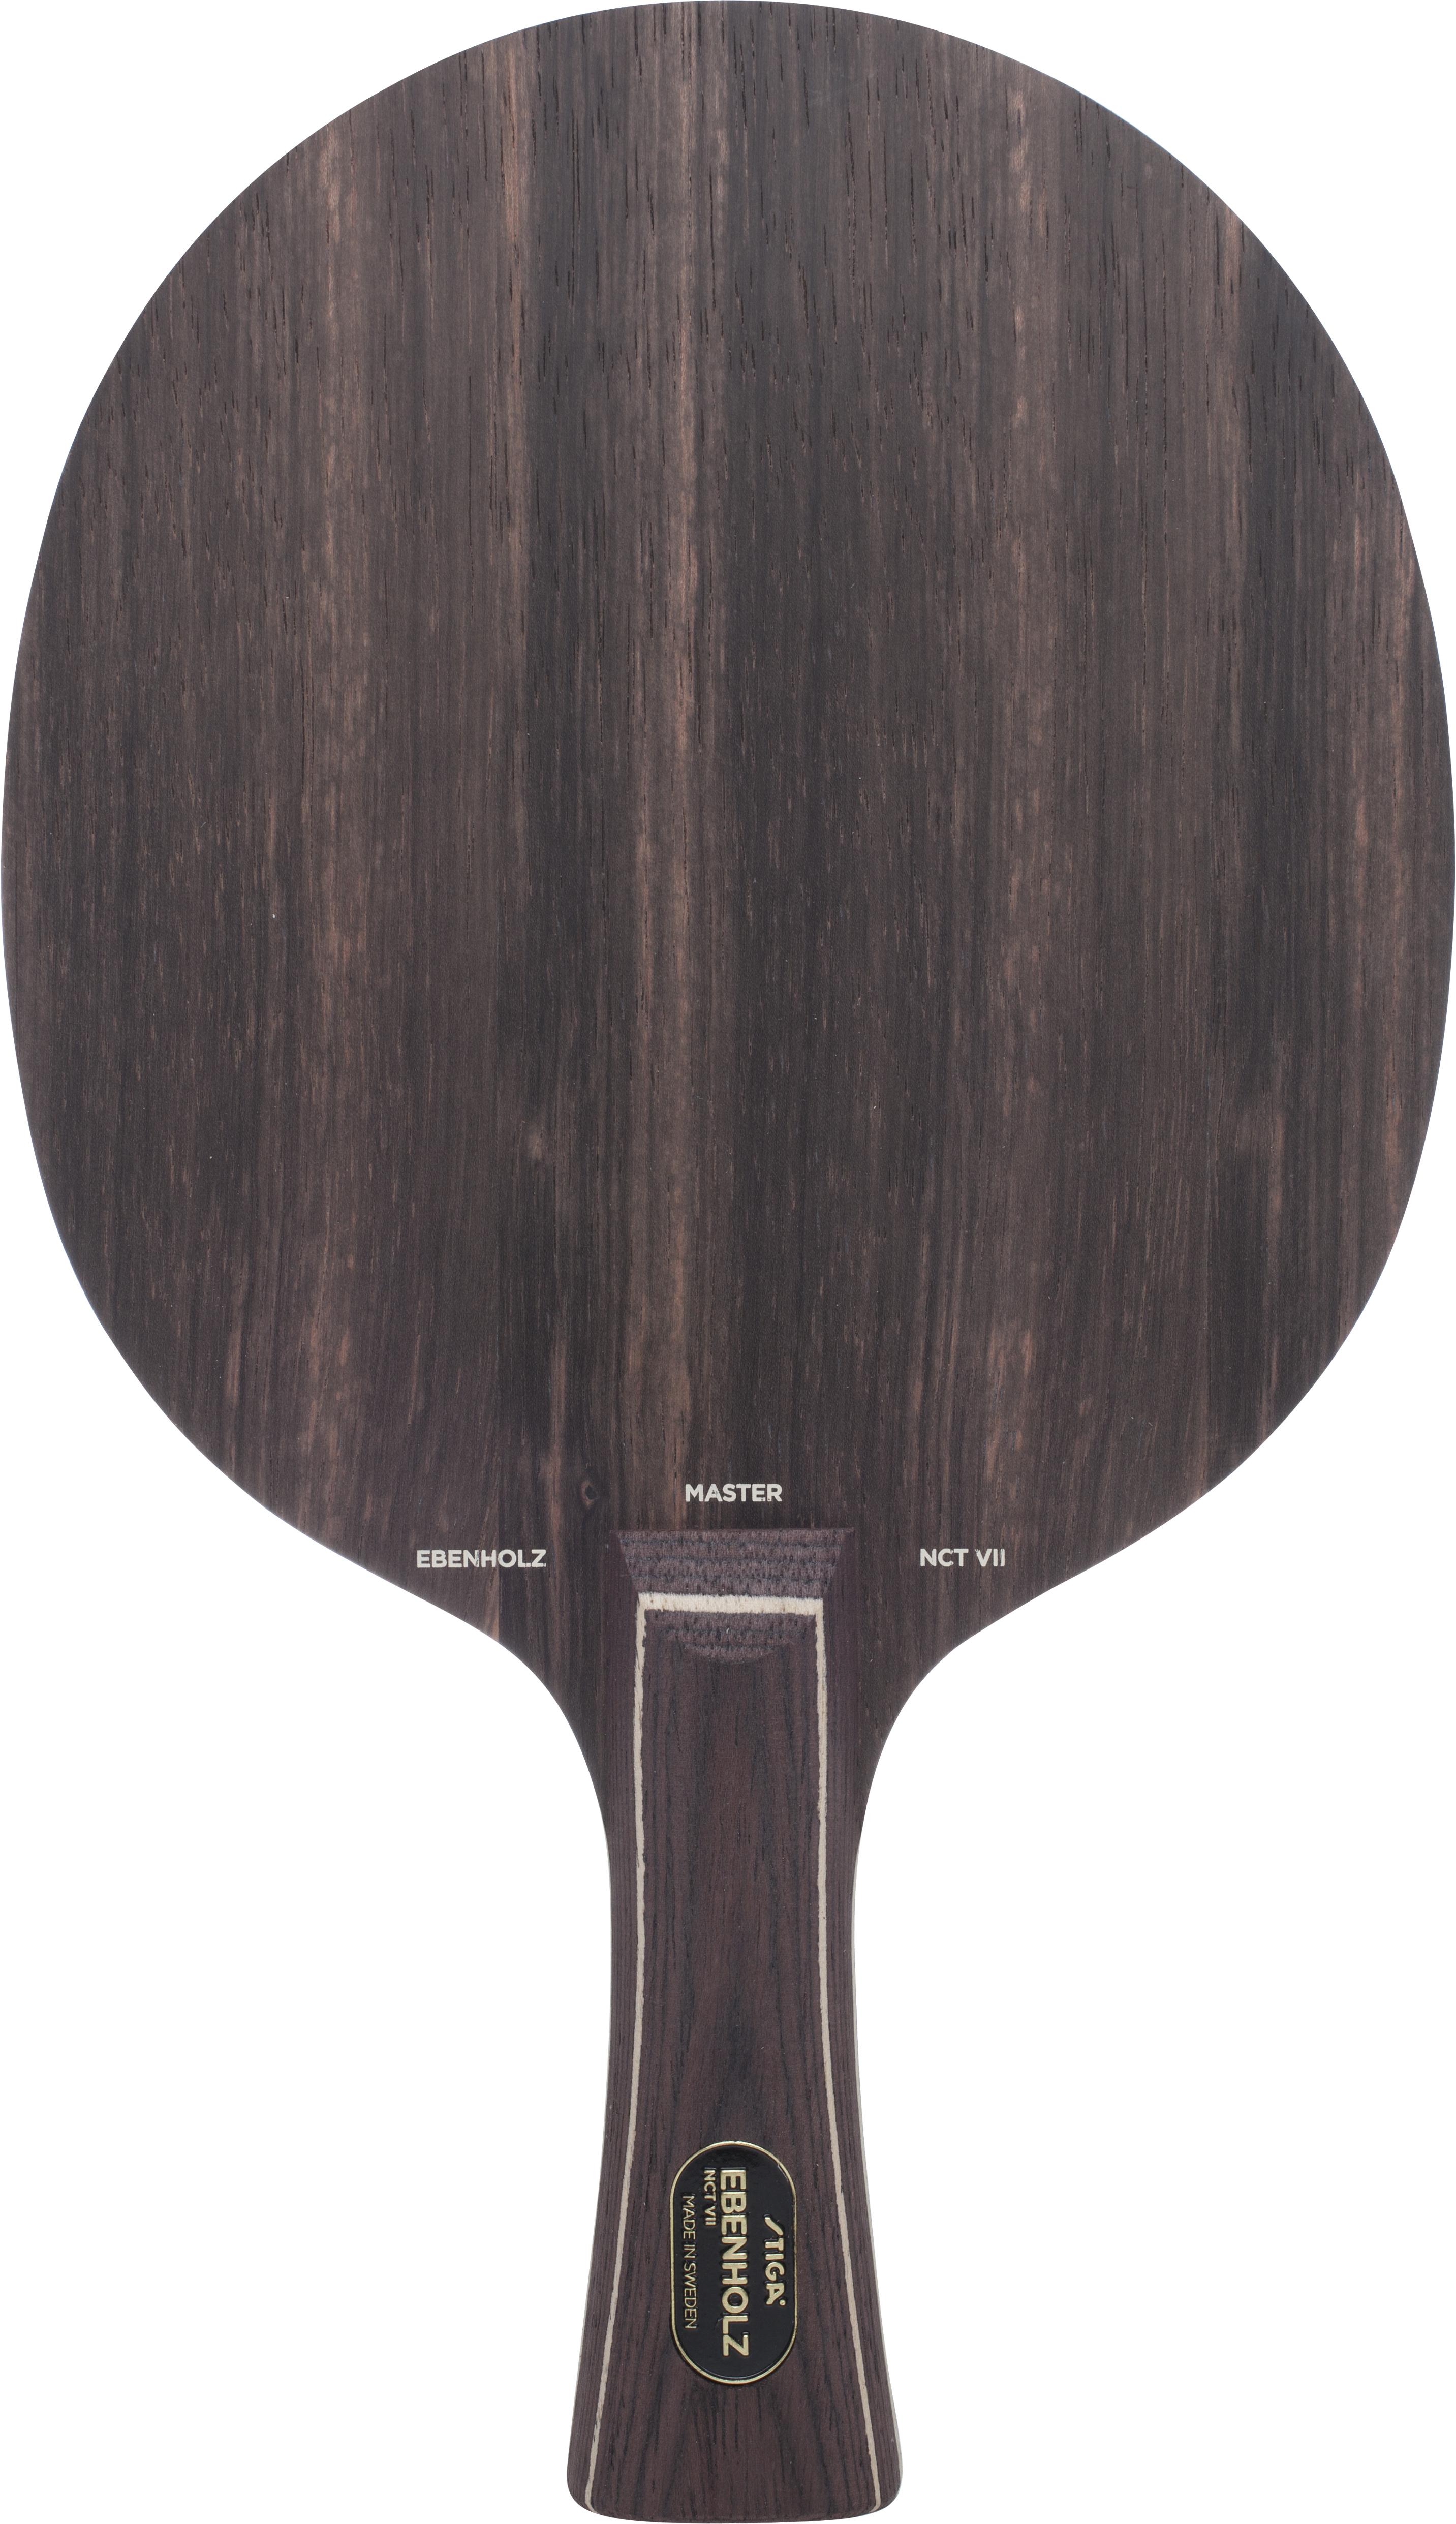 stiga-ebenholz-nct-vii-tischtennis-holz